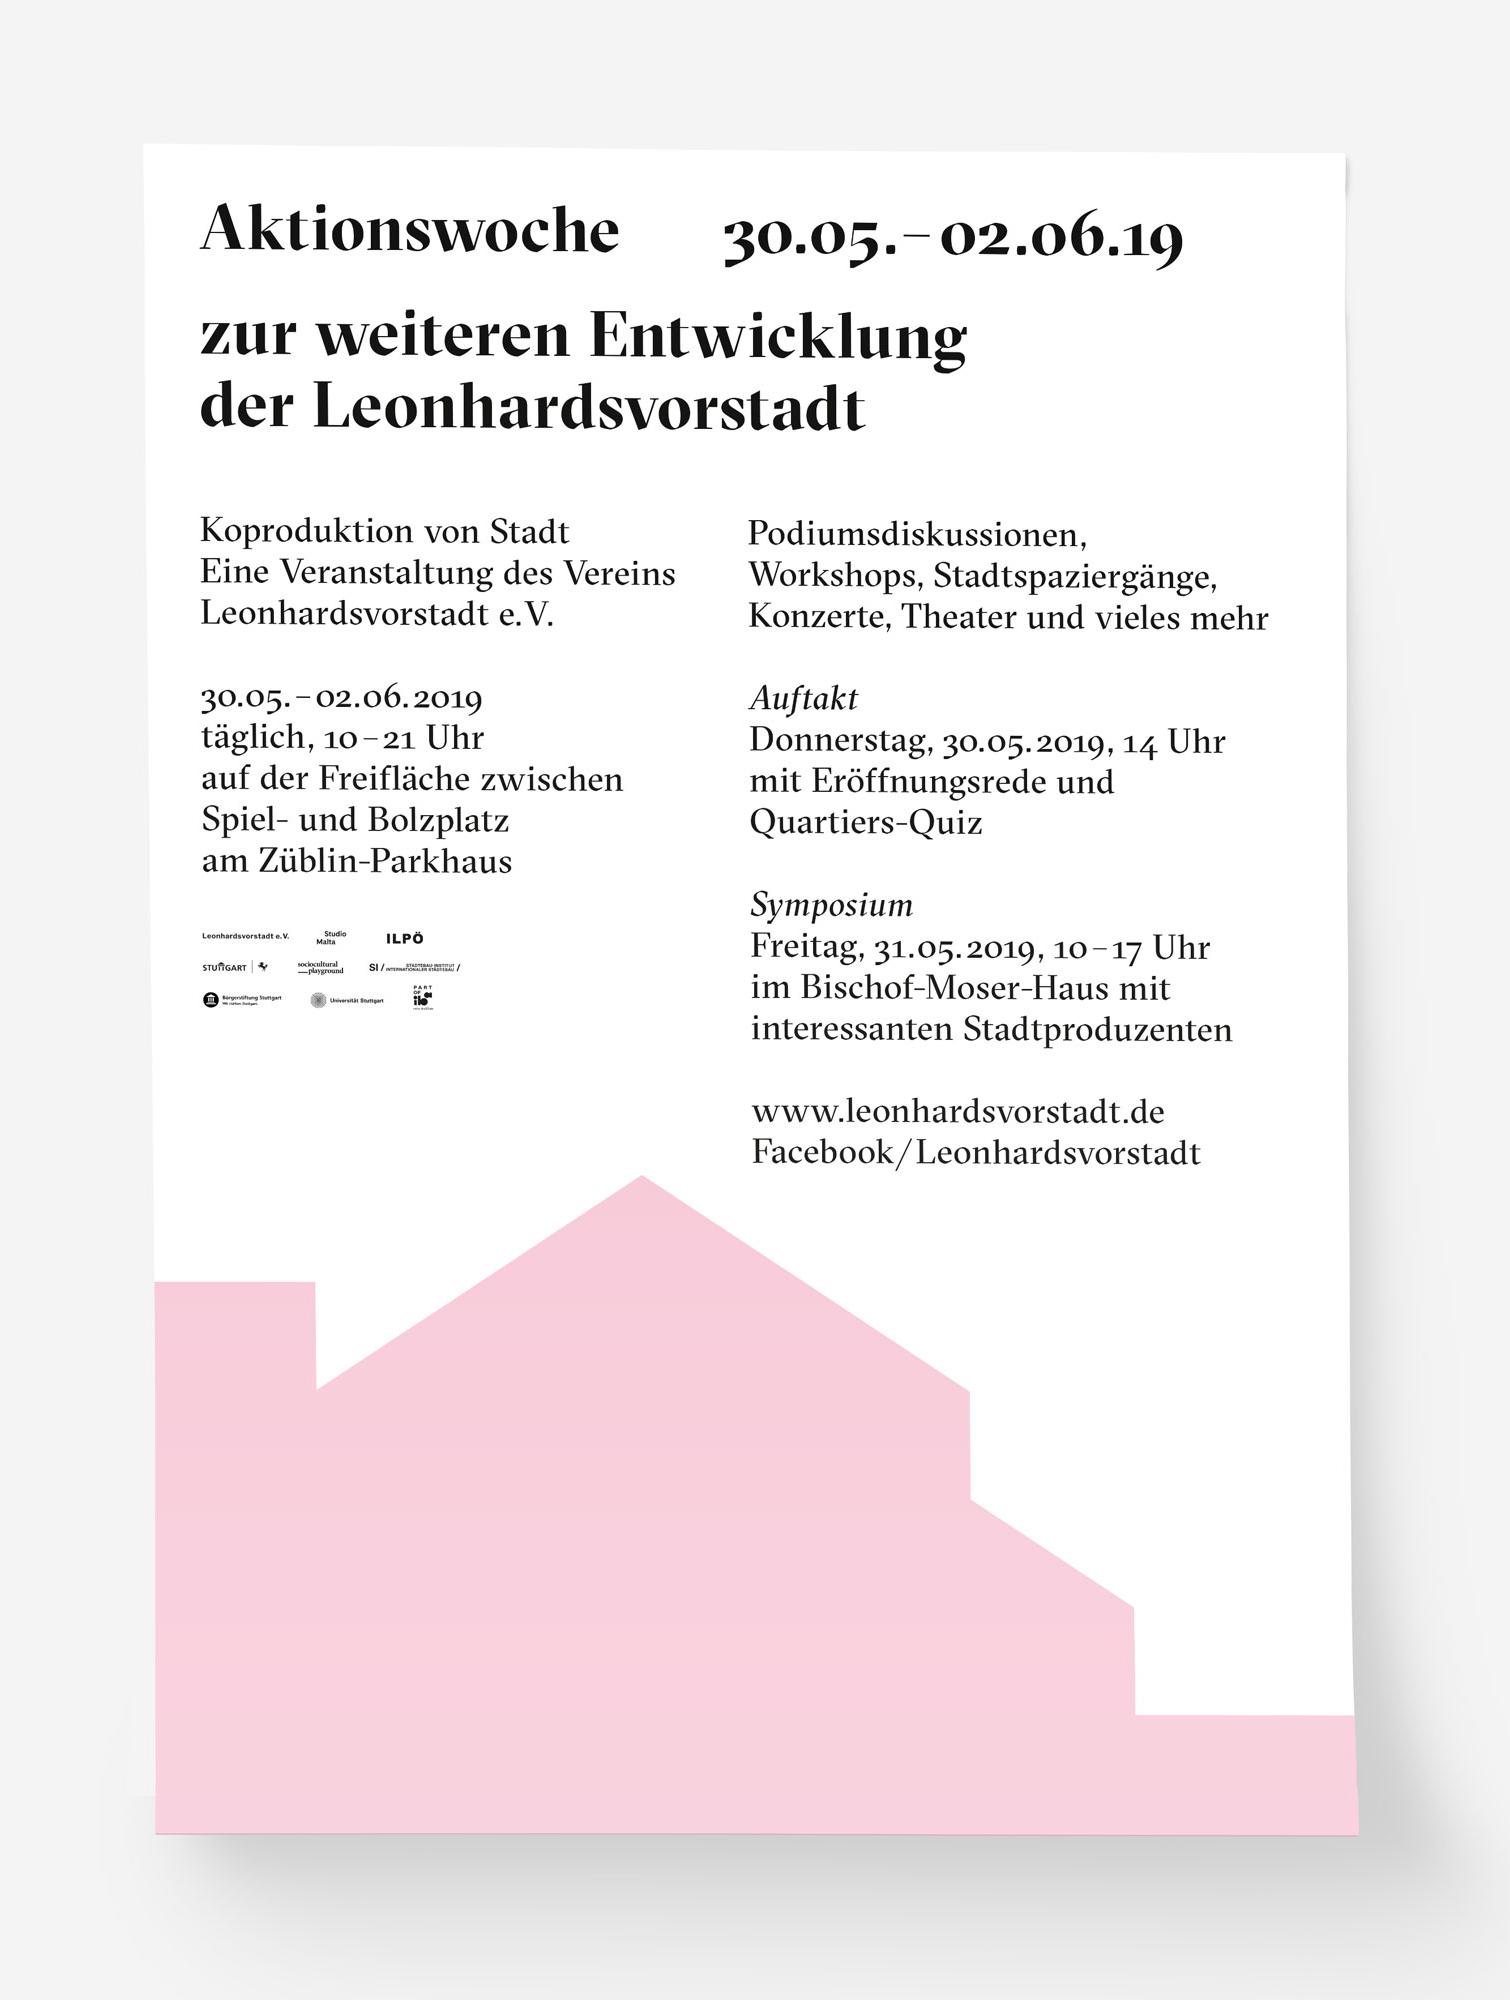 Aktionswoche Leonhardsvorstadt 4